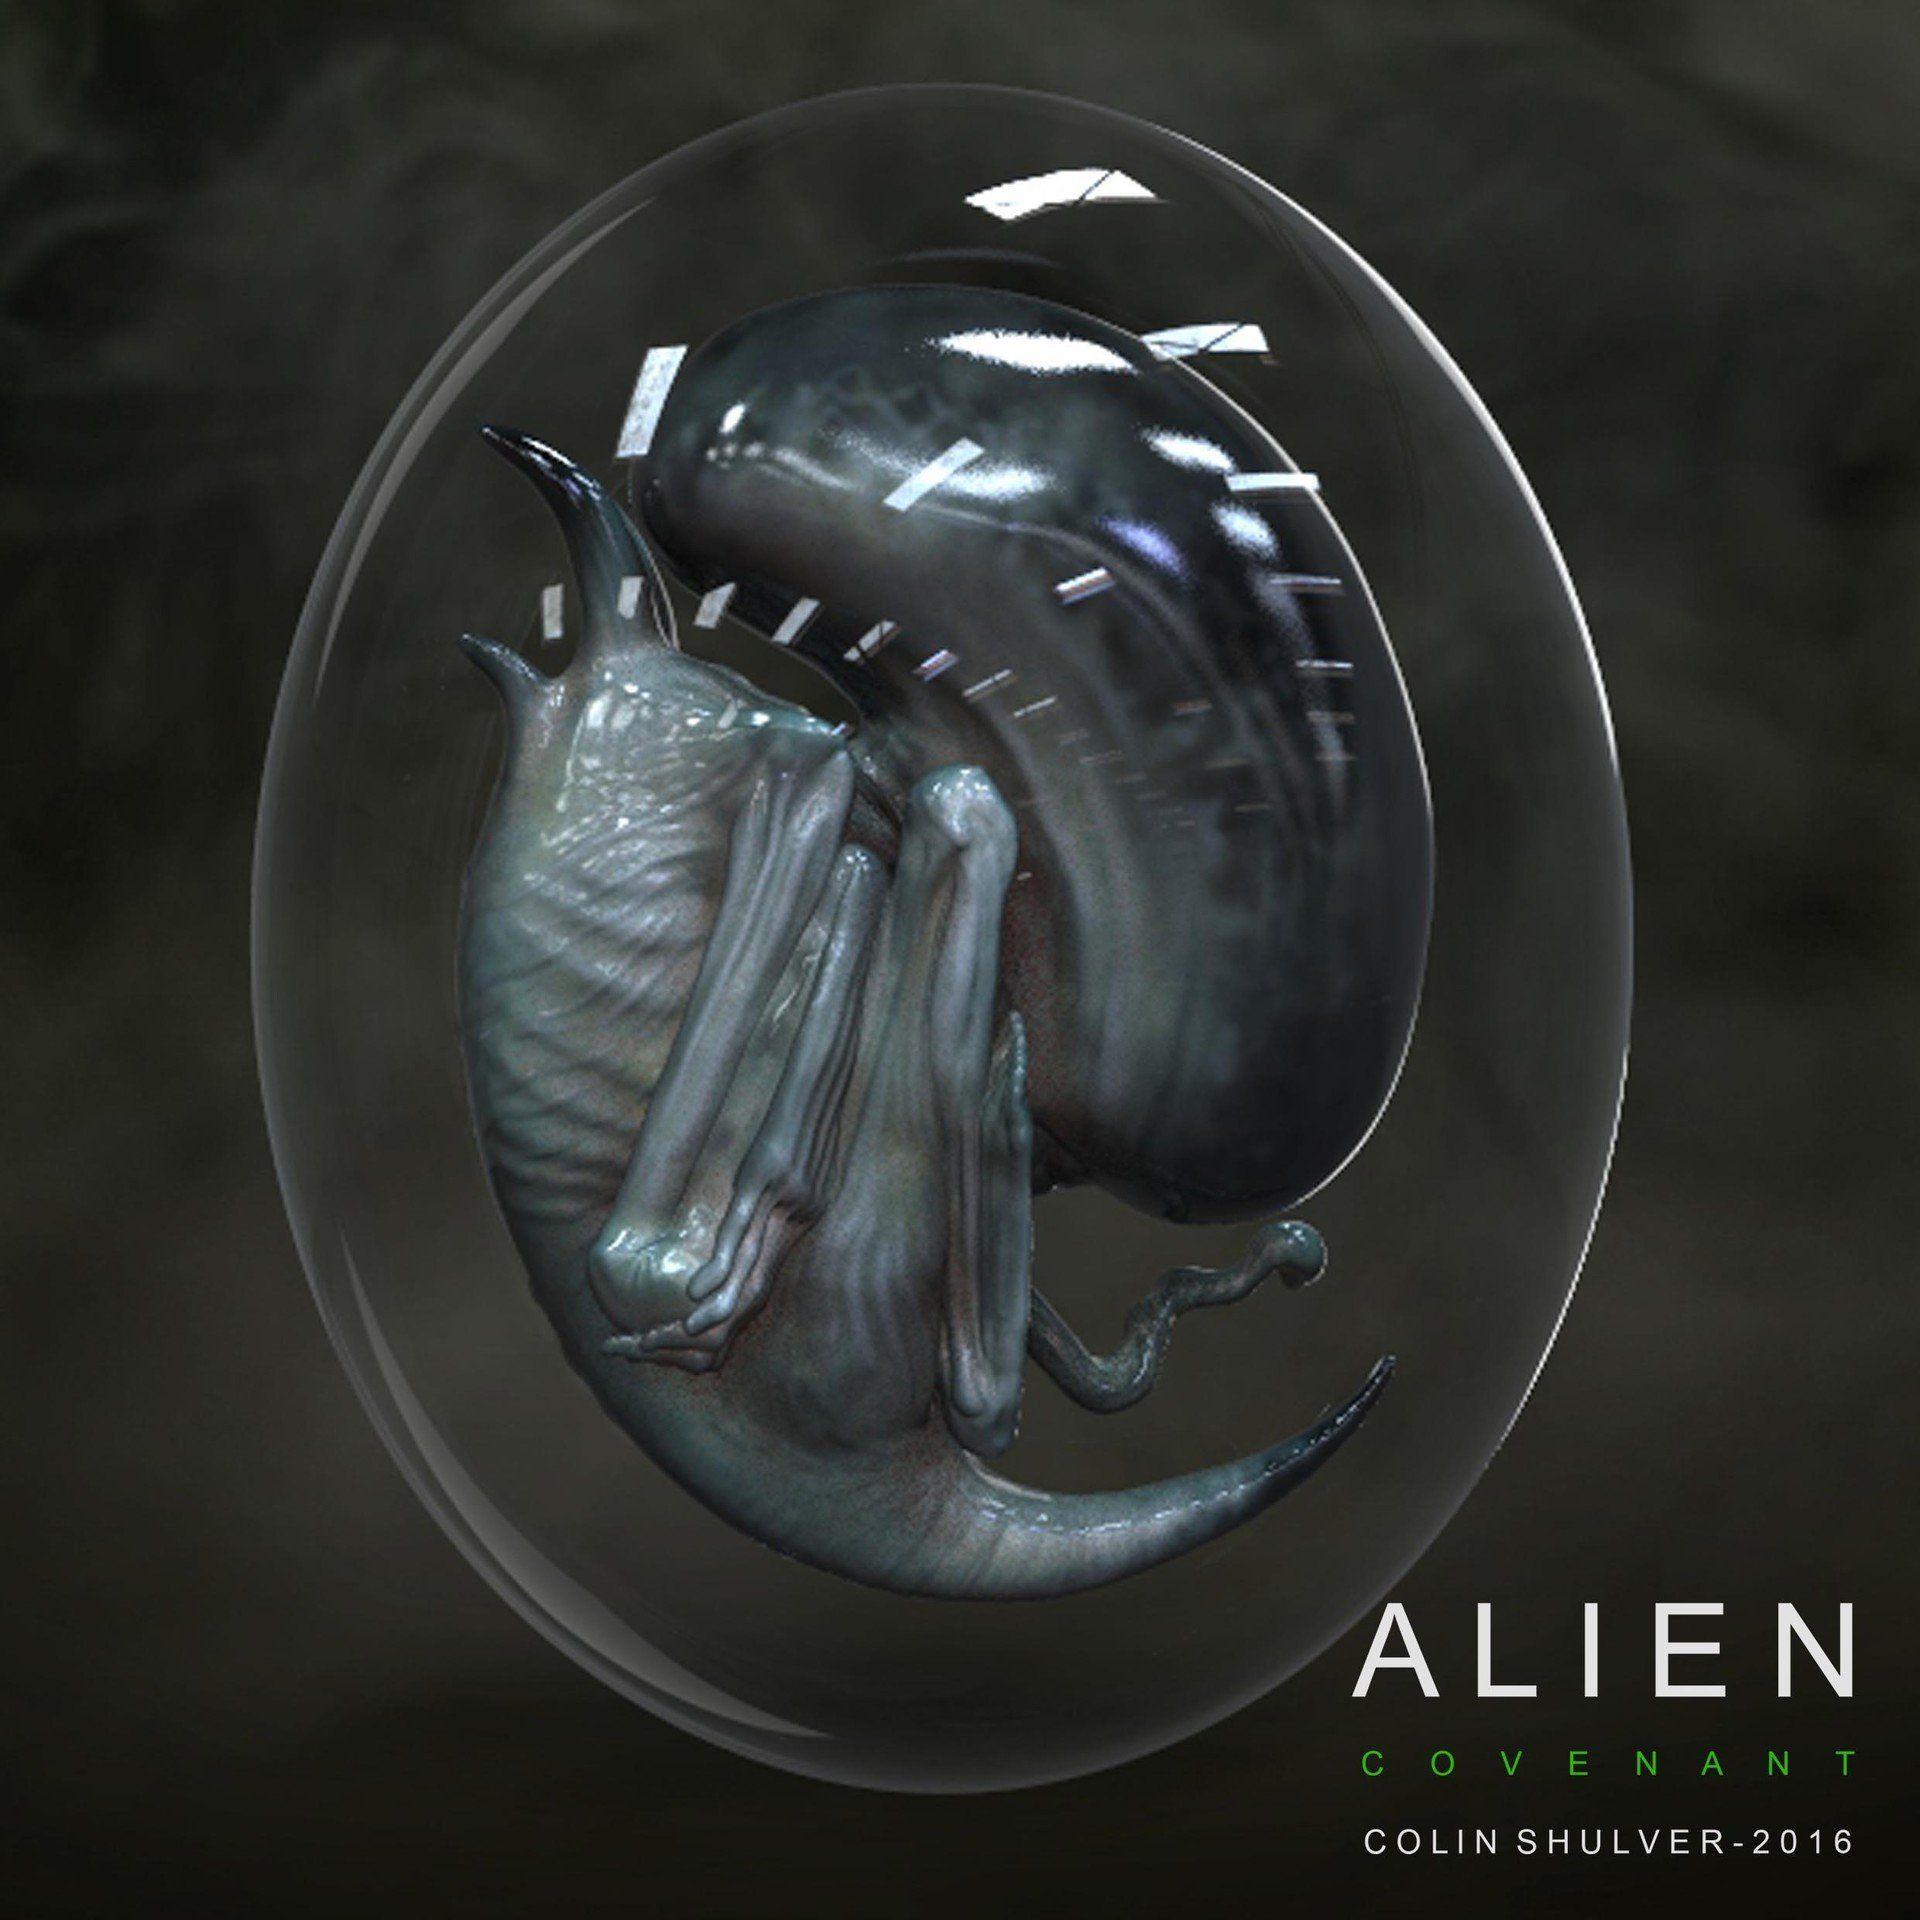 Alien: Covenant Protomorph Concept Art by Colin Shulver! - Alien: Covenant Movie News